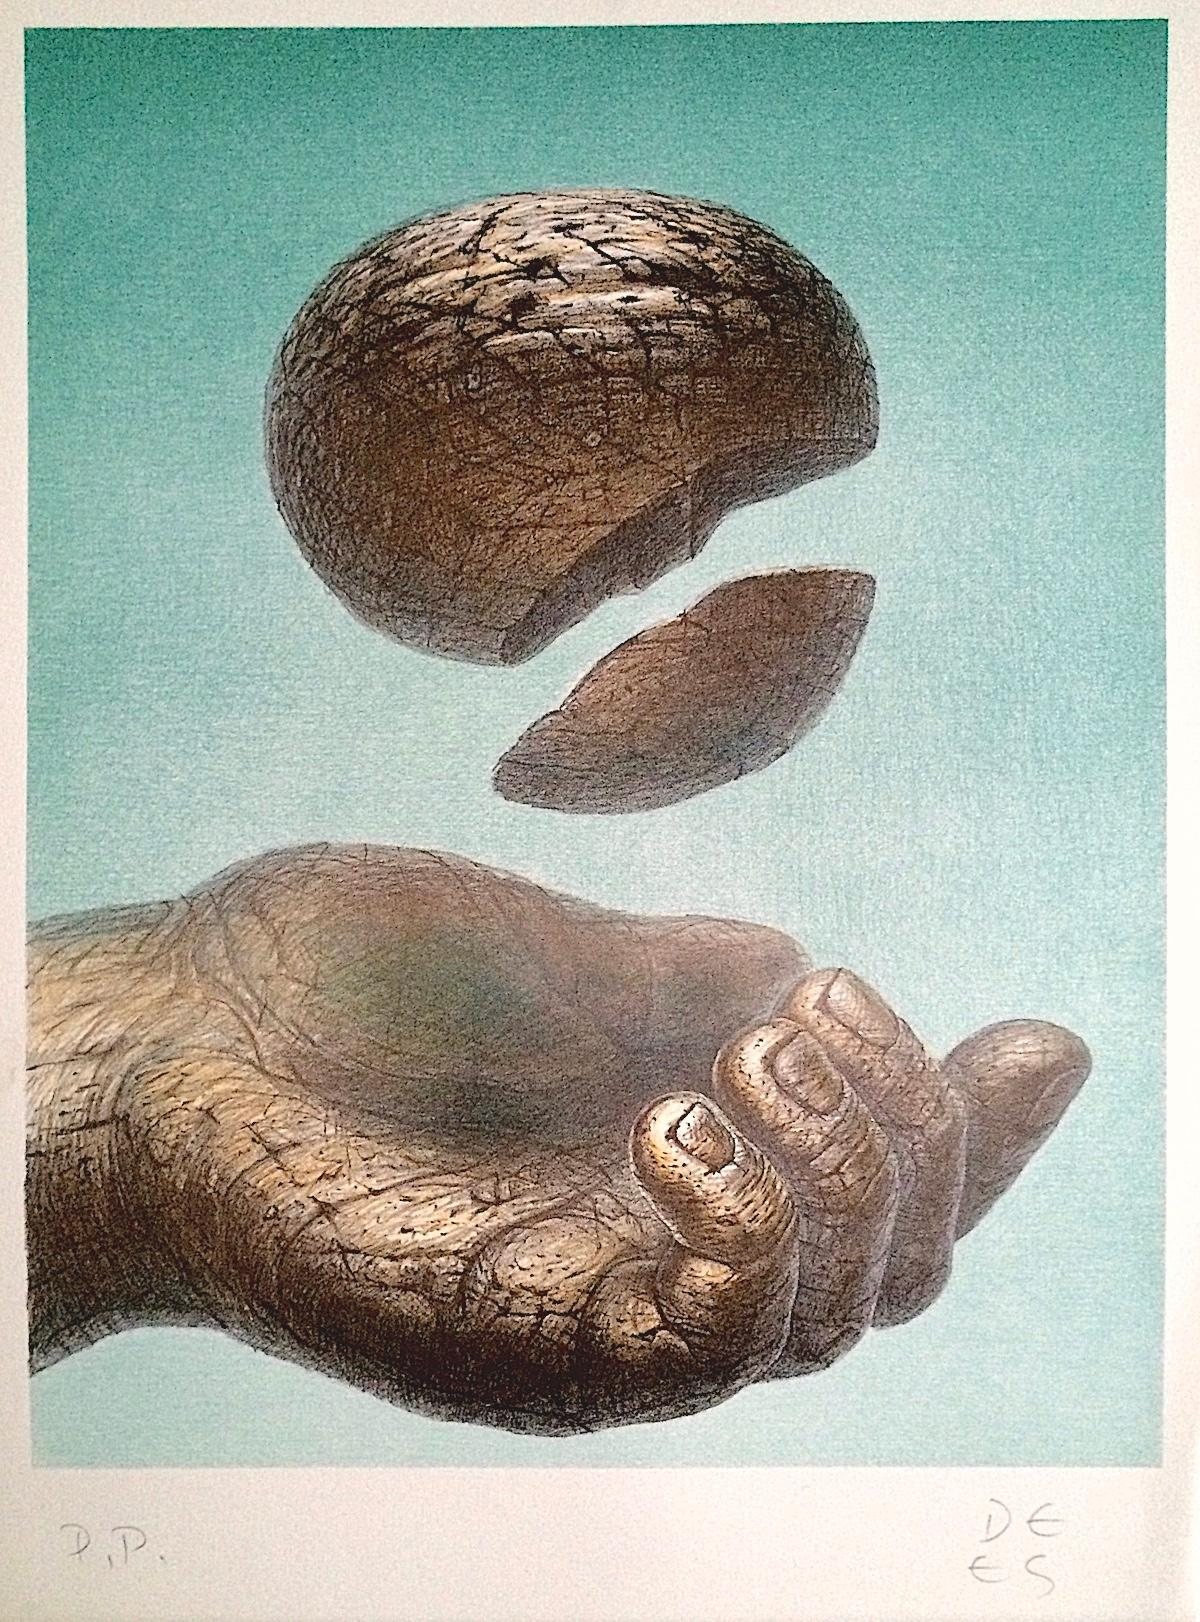 RECEIVING HAND Signed Original Lithograph, Hand, Stone, Healing Art